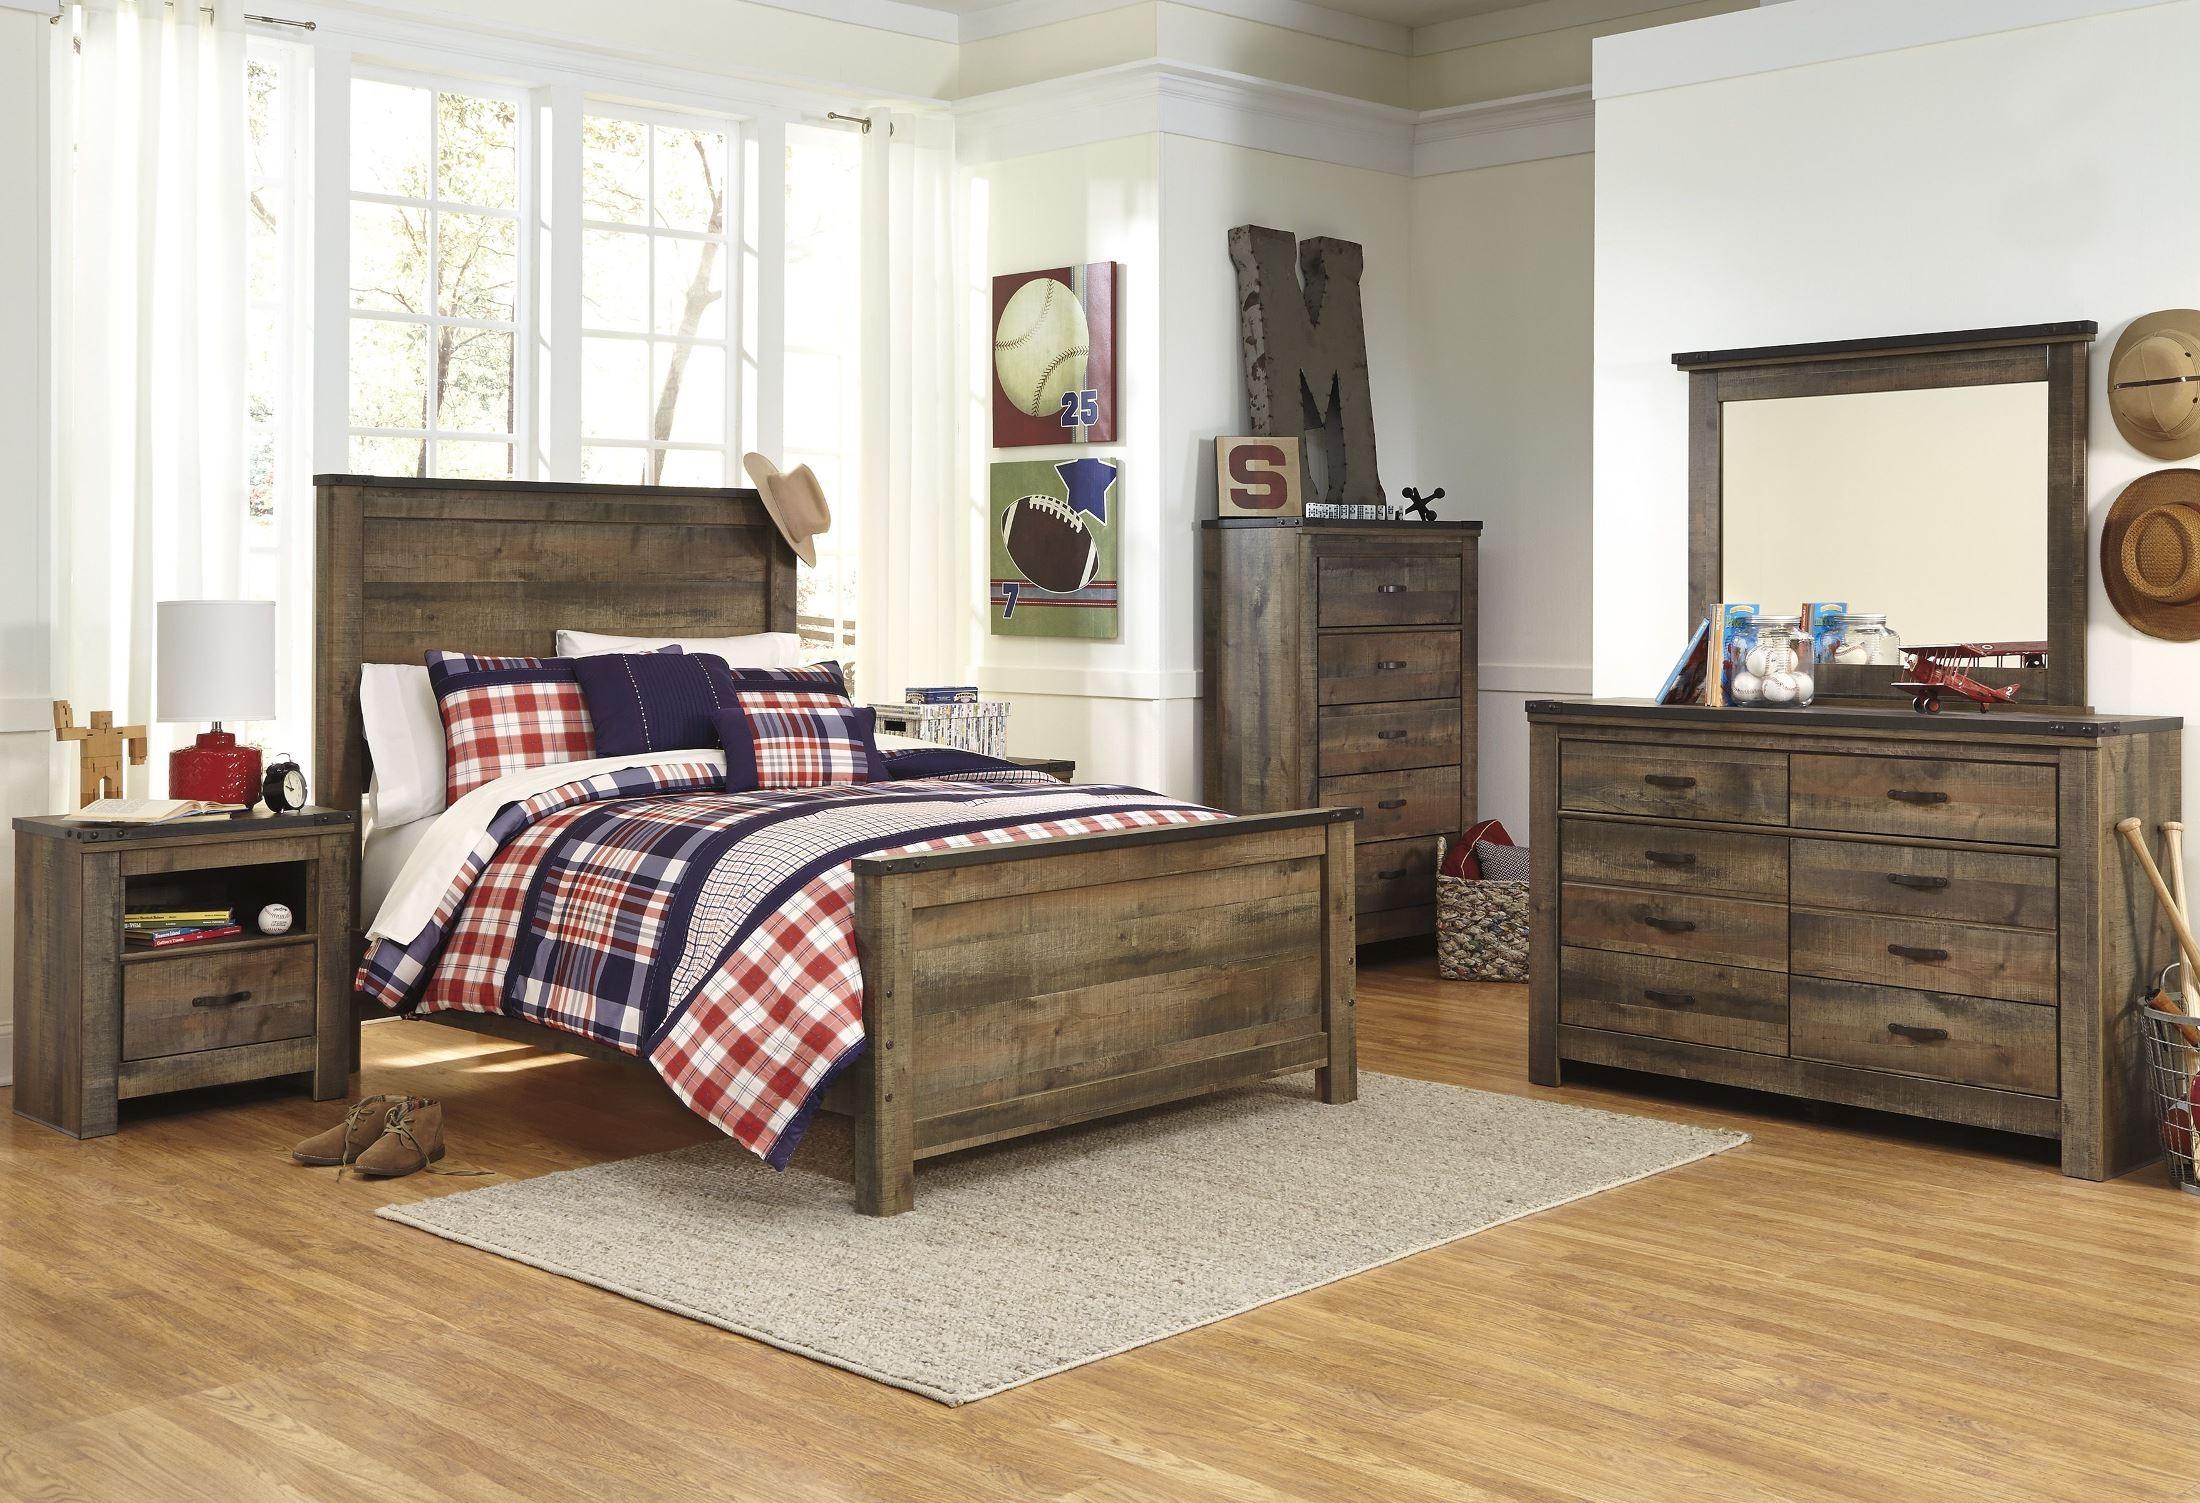 trinell brown panel bedroom set from ashley b446 54 57 96 coleman furniture. Black Bedroom Furniture Sets. Home Design Ideas